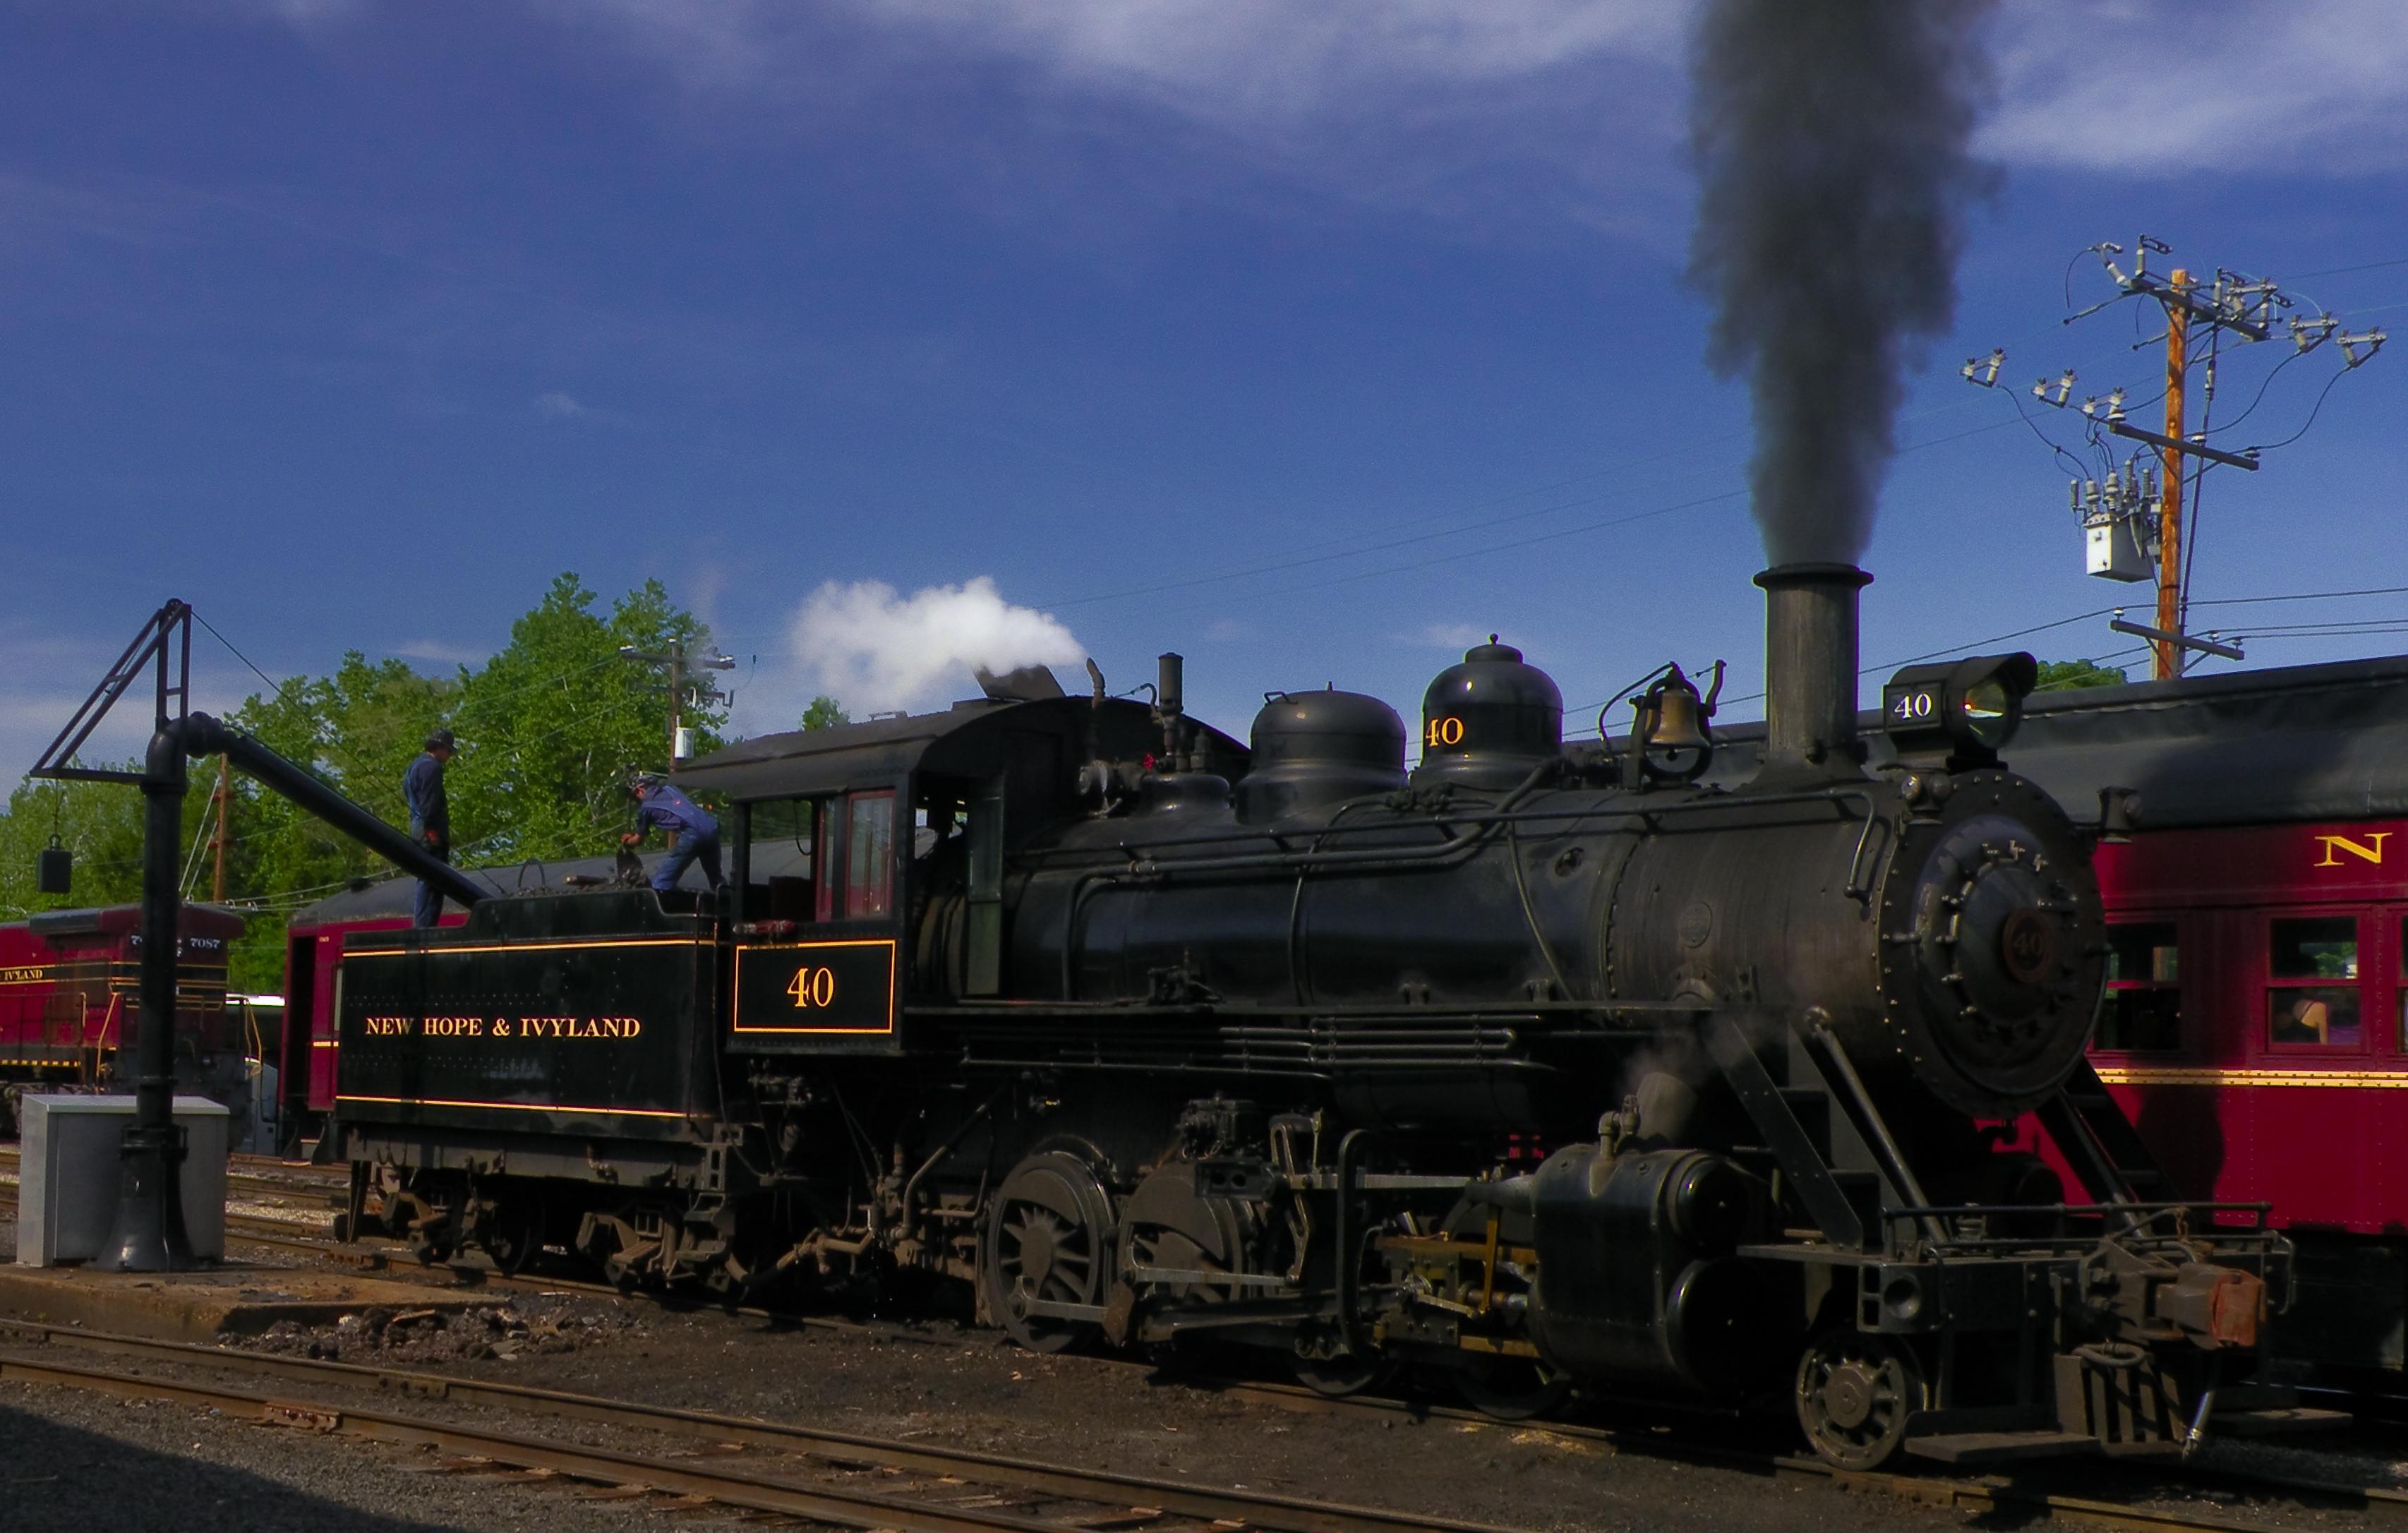 Kingston Flyer steam train in New Zealand at Kingston station ...